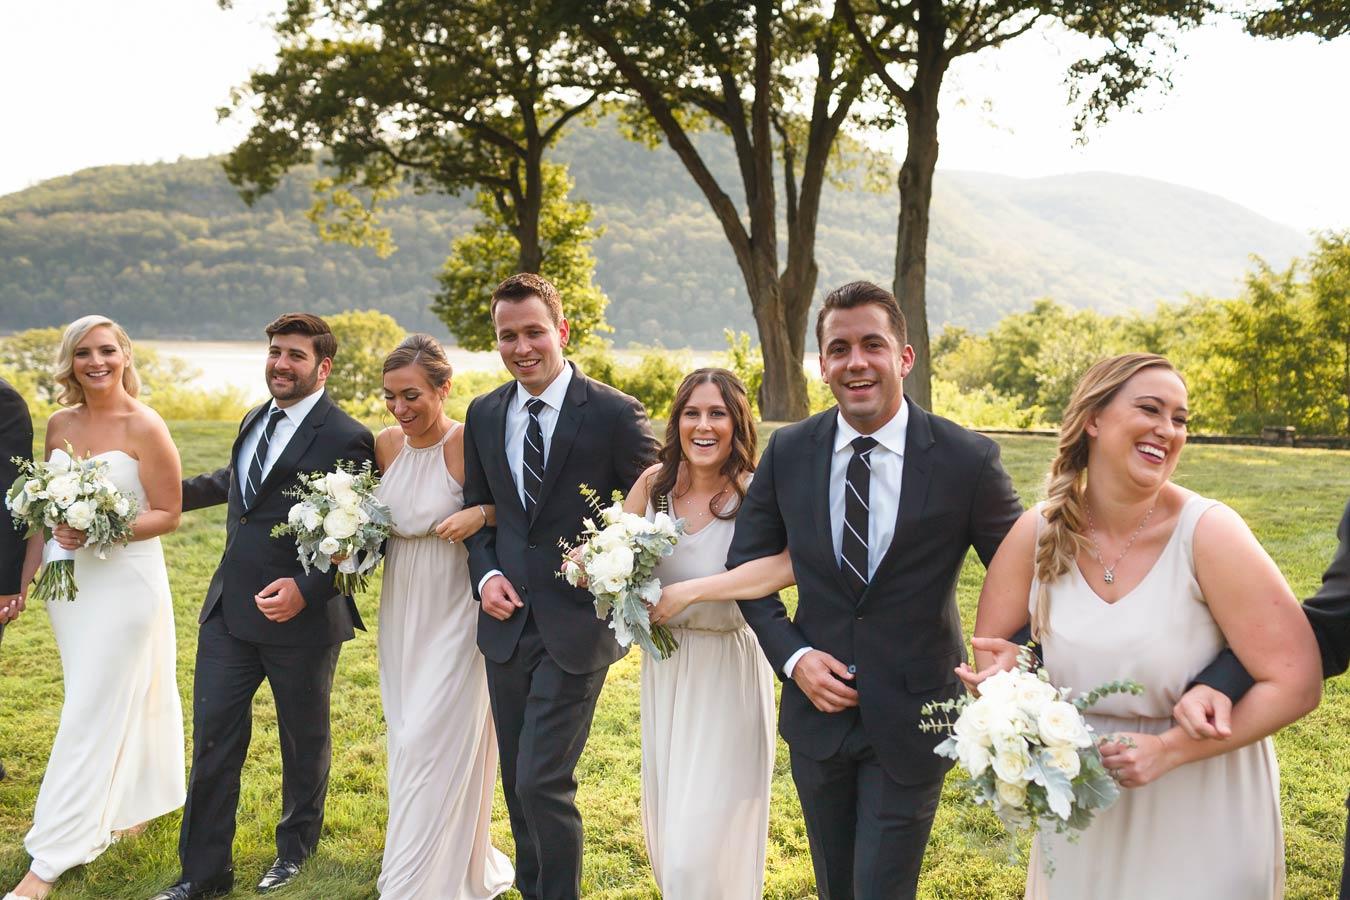 monterverde-oldtone-manor-westchester-wedding-photogrpher0025.jpg